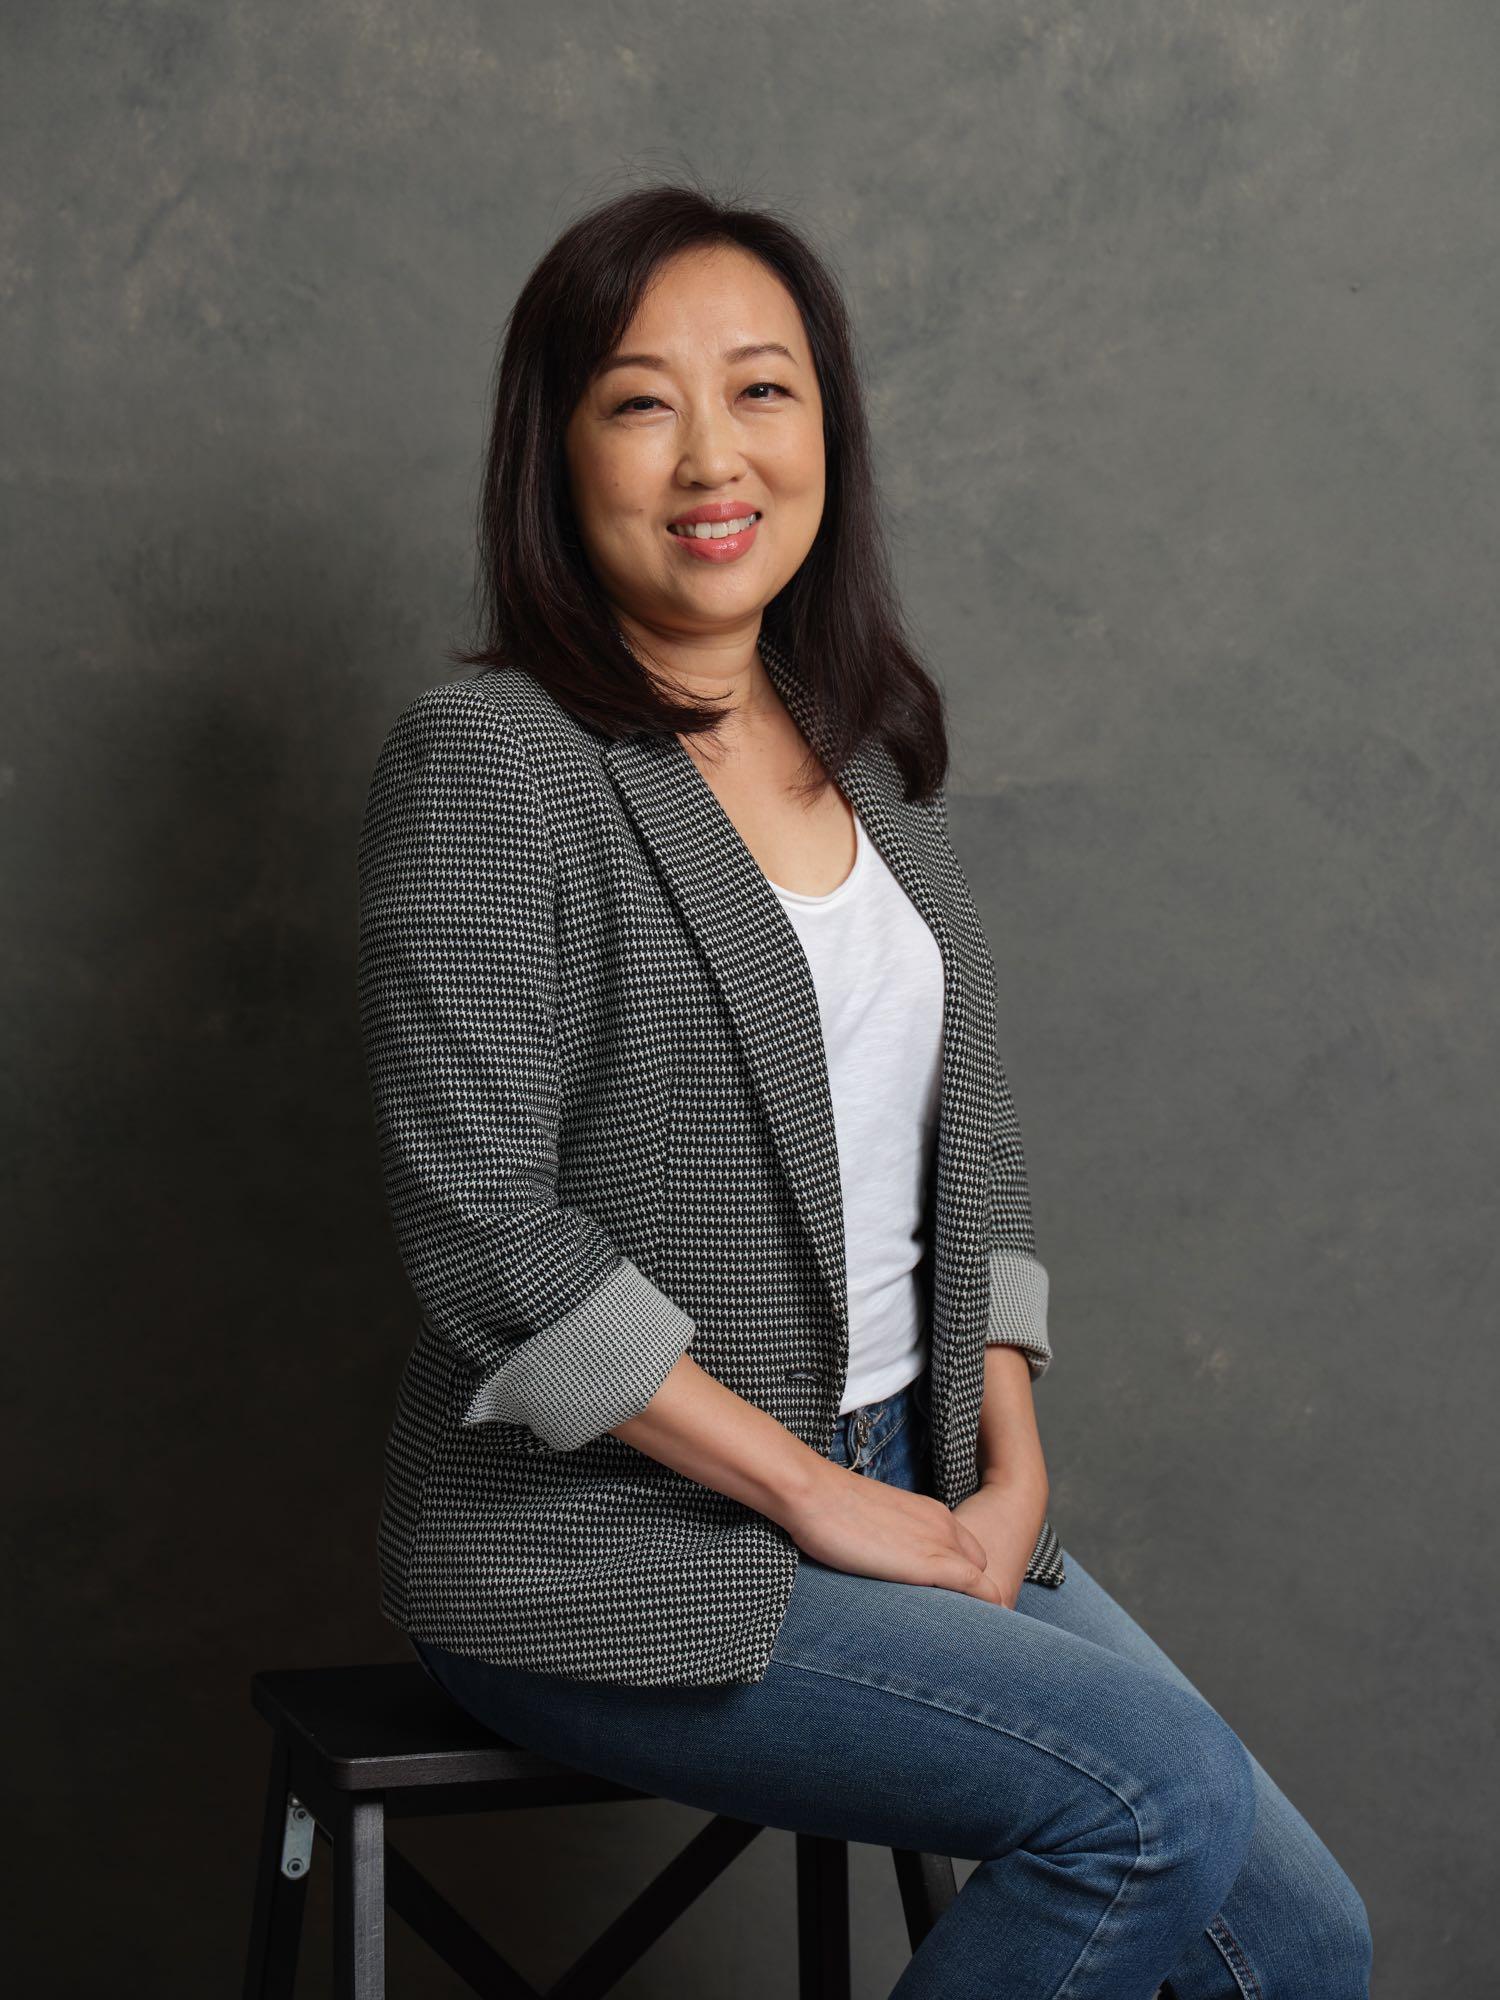 Headshot Photography Singapore Portrait Photographer COCO Creative Studio 25801